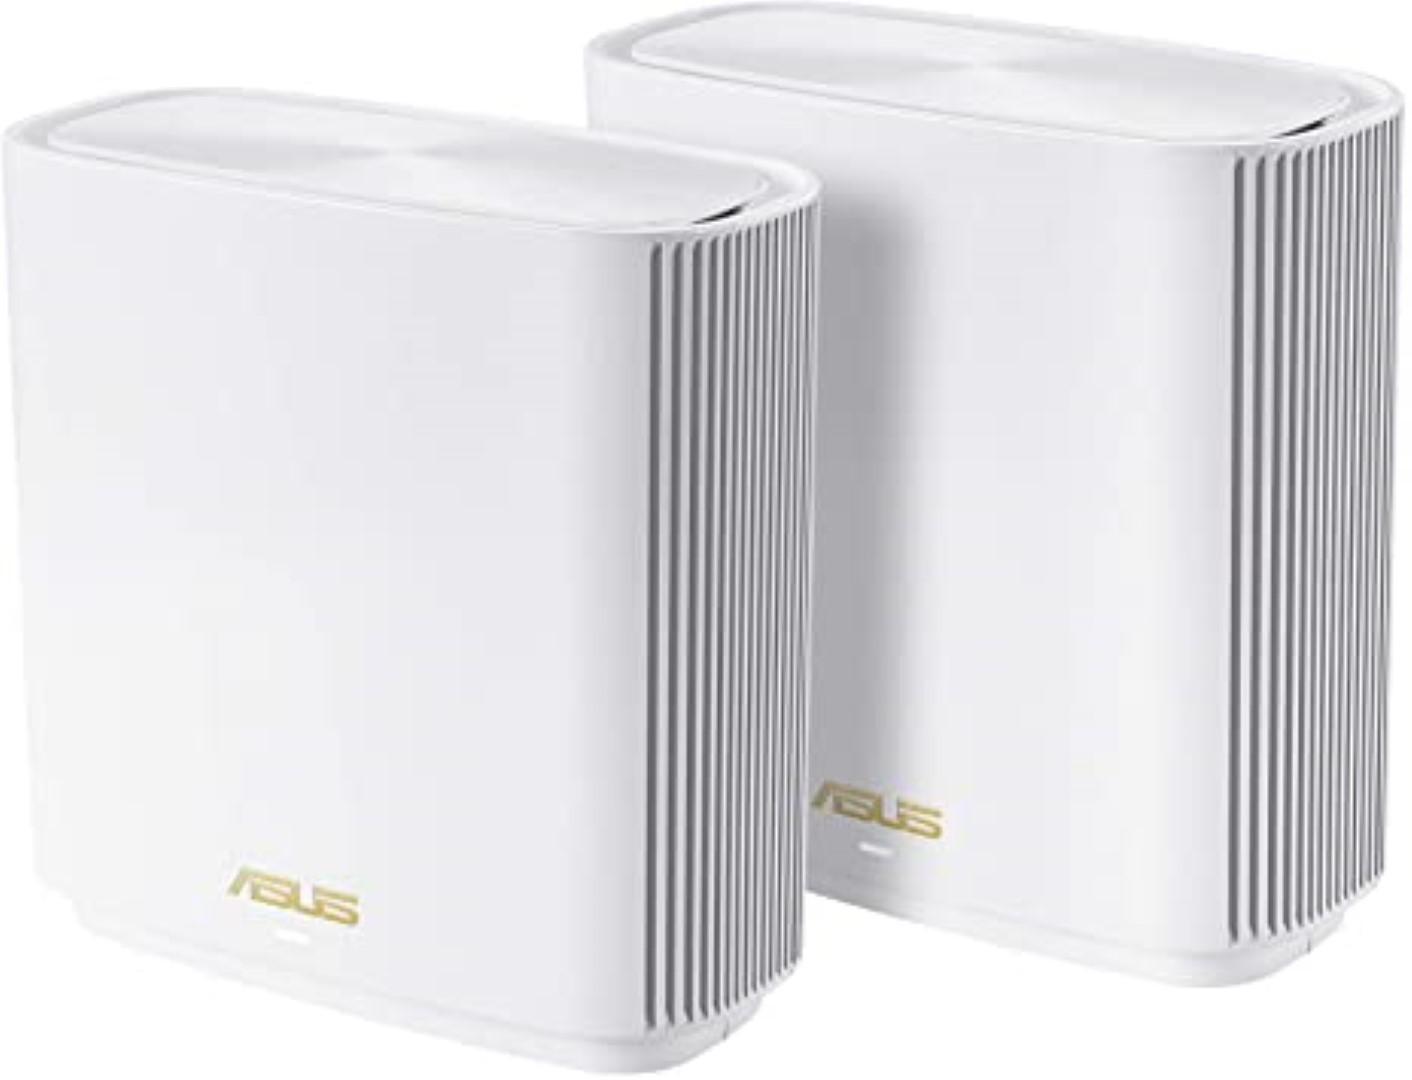 Asus Tri band large home Mesh ZENwifi system, XT8 2 pack; 1.5 GHz quad- core processor, 256 MB Flash, 512 MB RAM ; Network Standard: IEEE: IEEE 802.11a, IEEE 802.11b, IEEE 802.11g, IEEE 802.11n, IEEE 802.11ac, IEEE 802.11ax, IPv4, IPv6; Antenna: 6x internal antennas; Transmit/Receive: 2.4 GHz 2 x 2 - imaginea 1